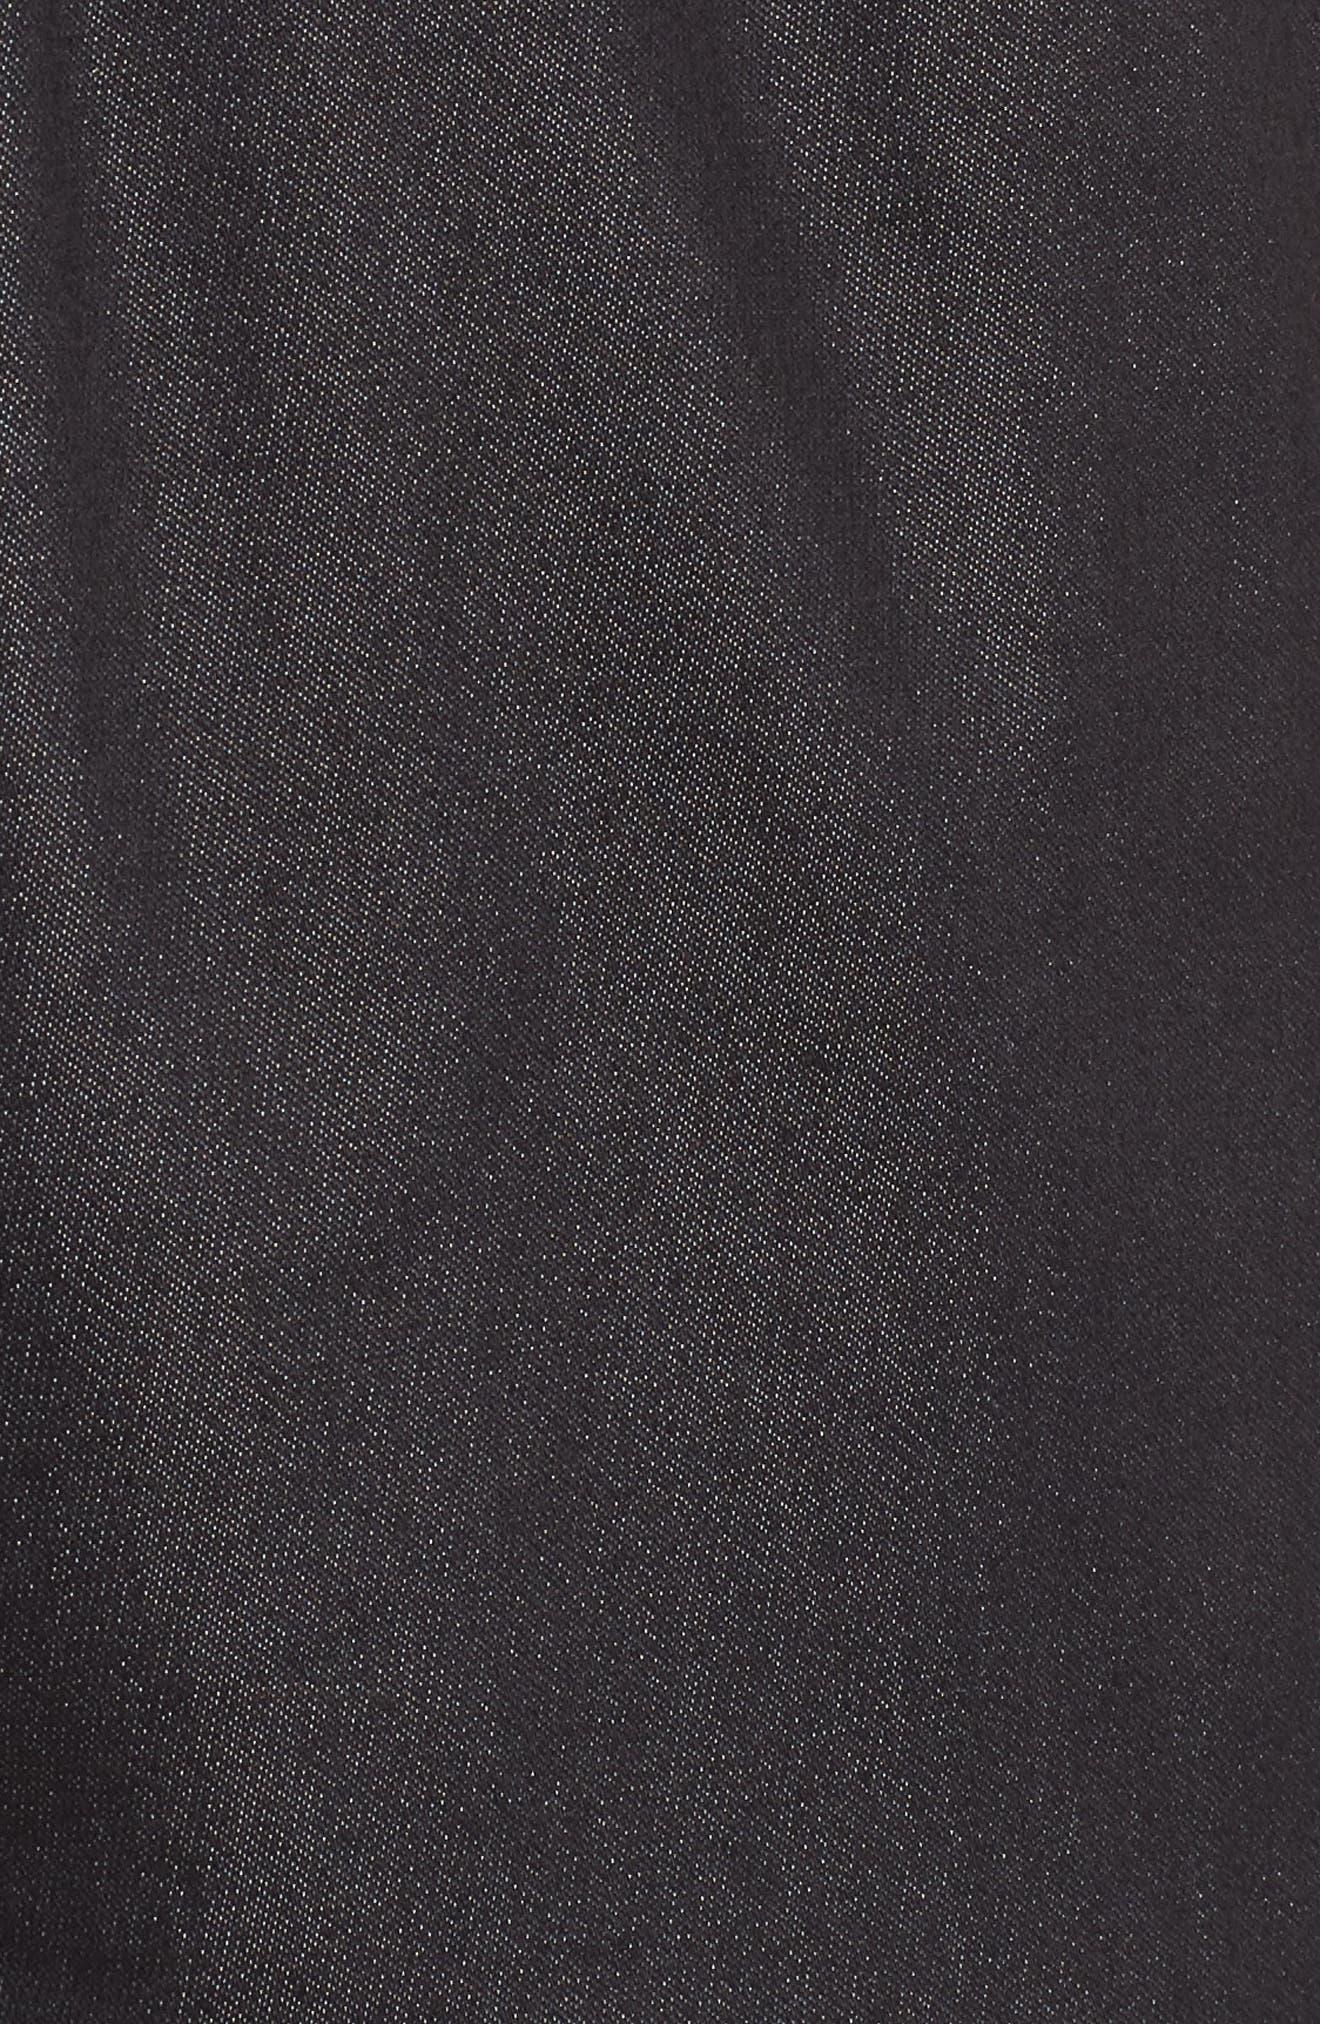 Getaway Shorts,                             Alternate thumbnail 6, color,                             Black